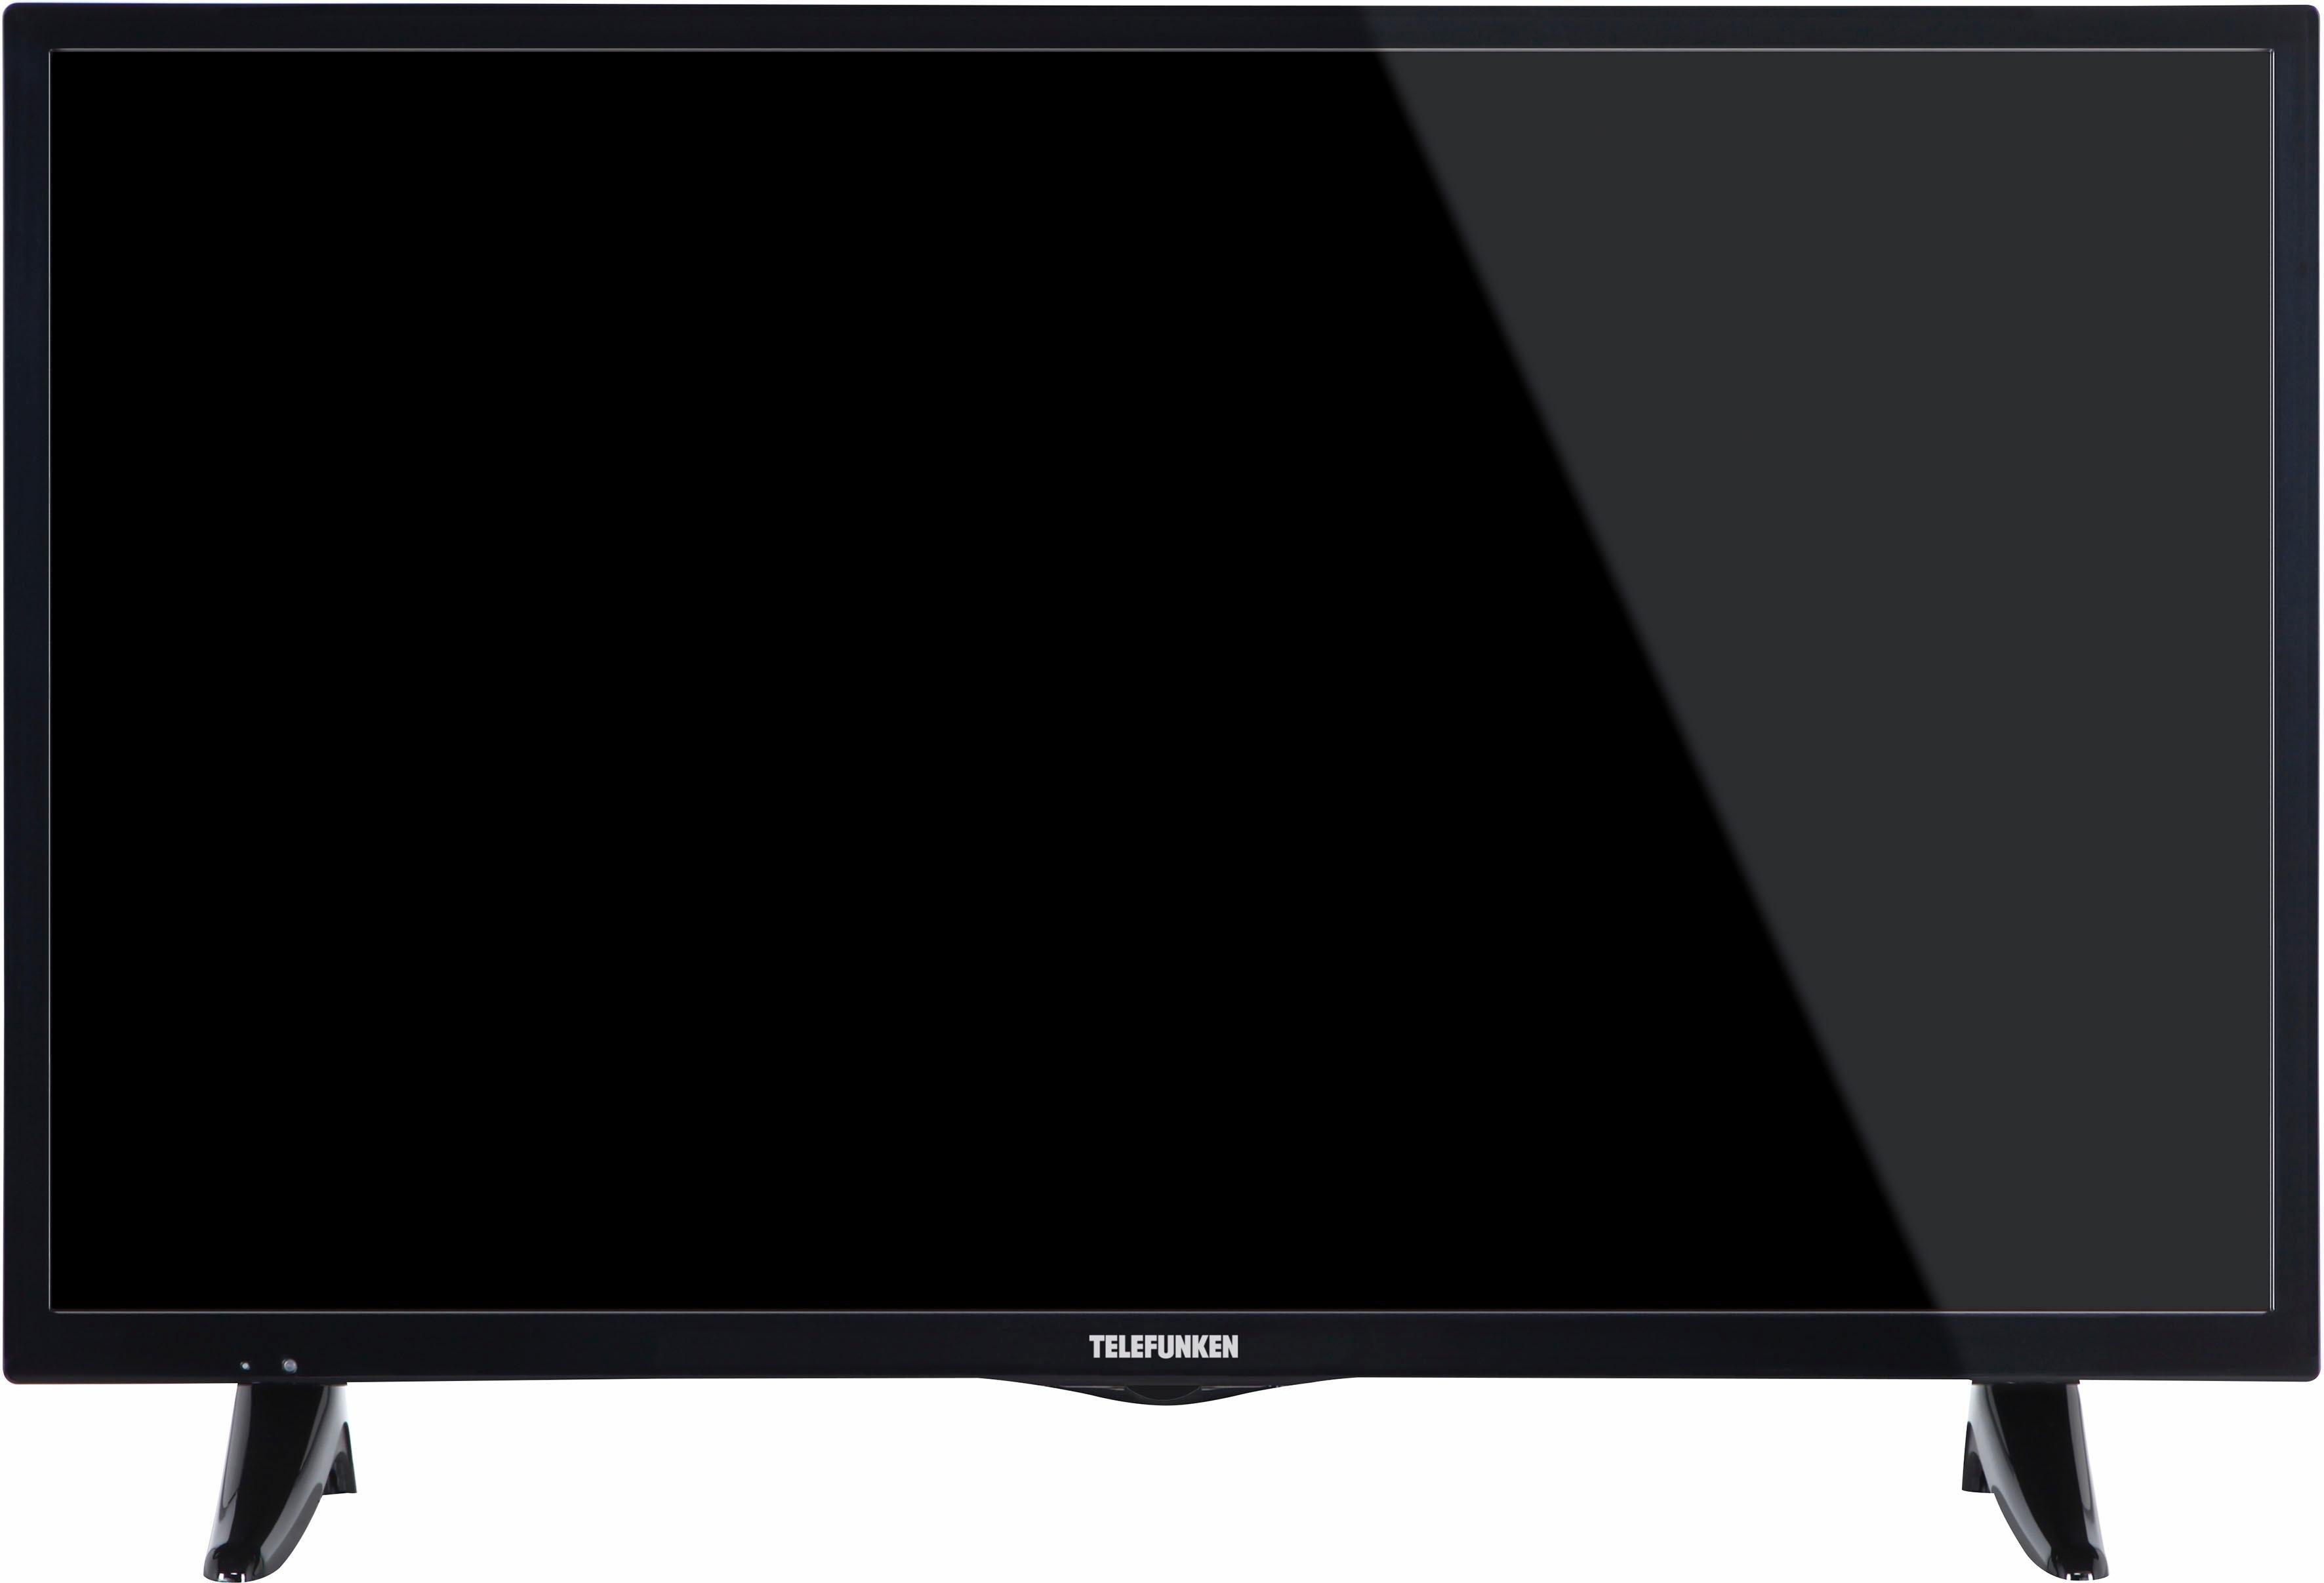 telefunken d32f289m4cw led tv 81 cm 32 inch 1080p full hd smart tv makkelijk gevonden otto. Black Bedroom Furniture Sets. Home Design Ideas